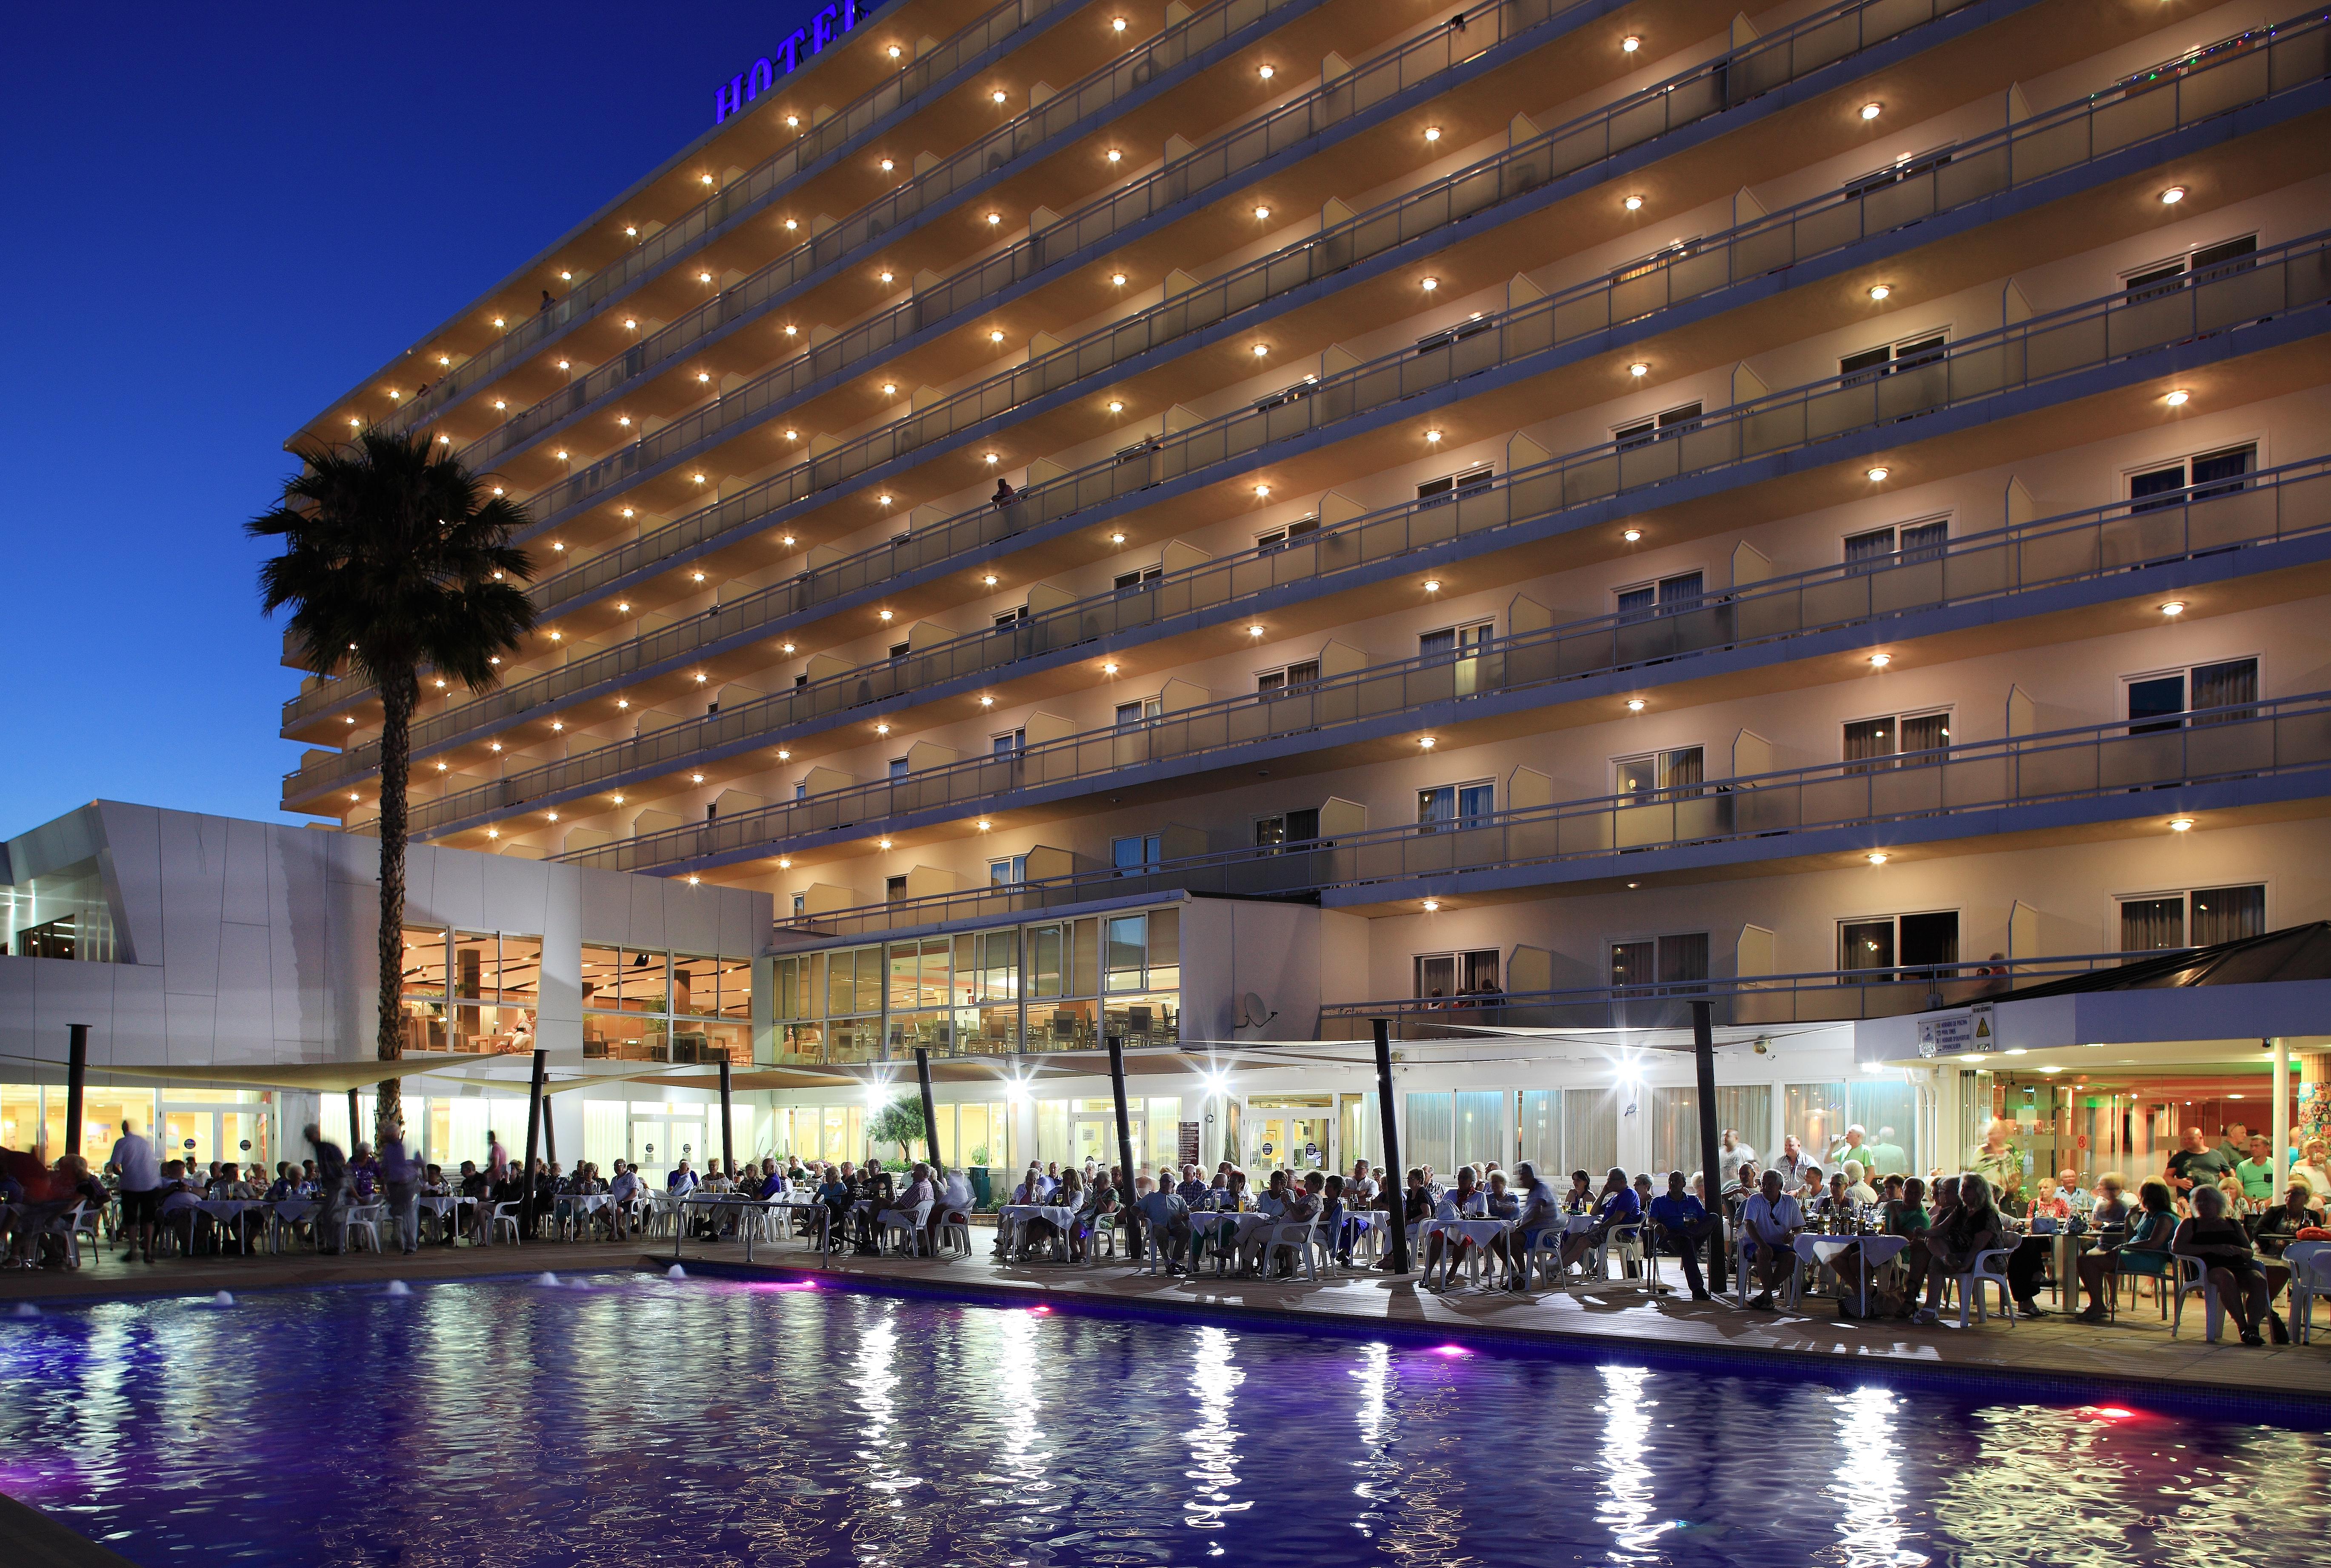 HOTEL HELIOS BENIDORM PISCINA TERRAZA NOCHE